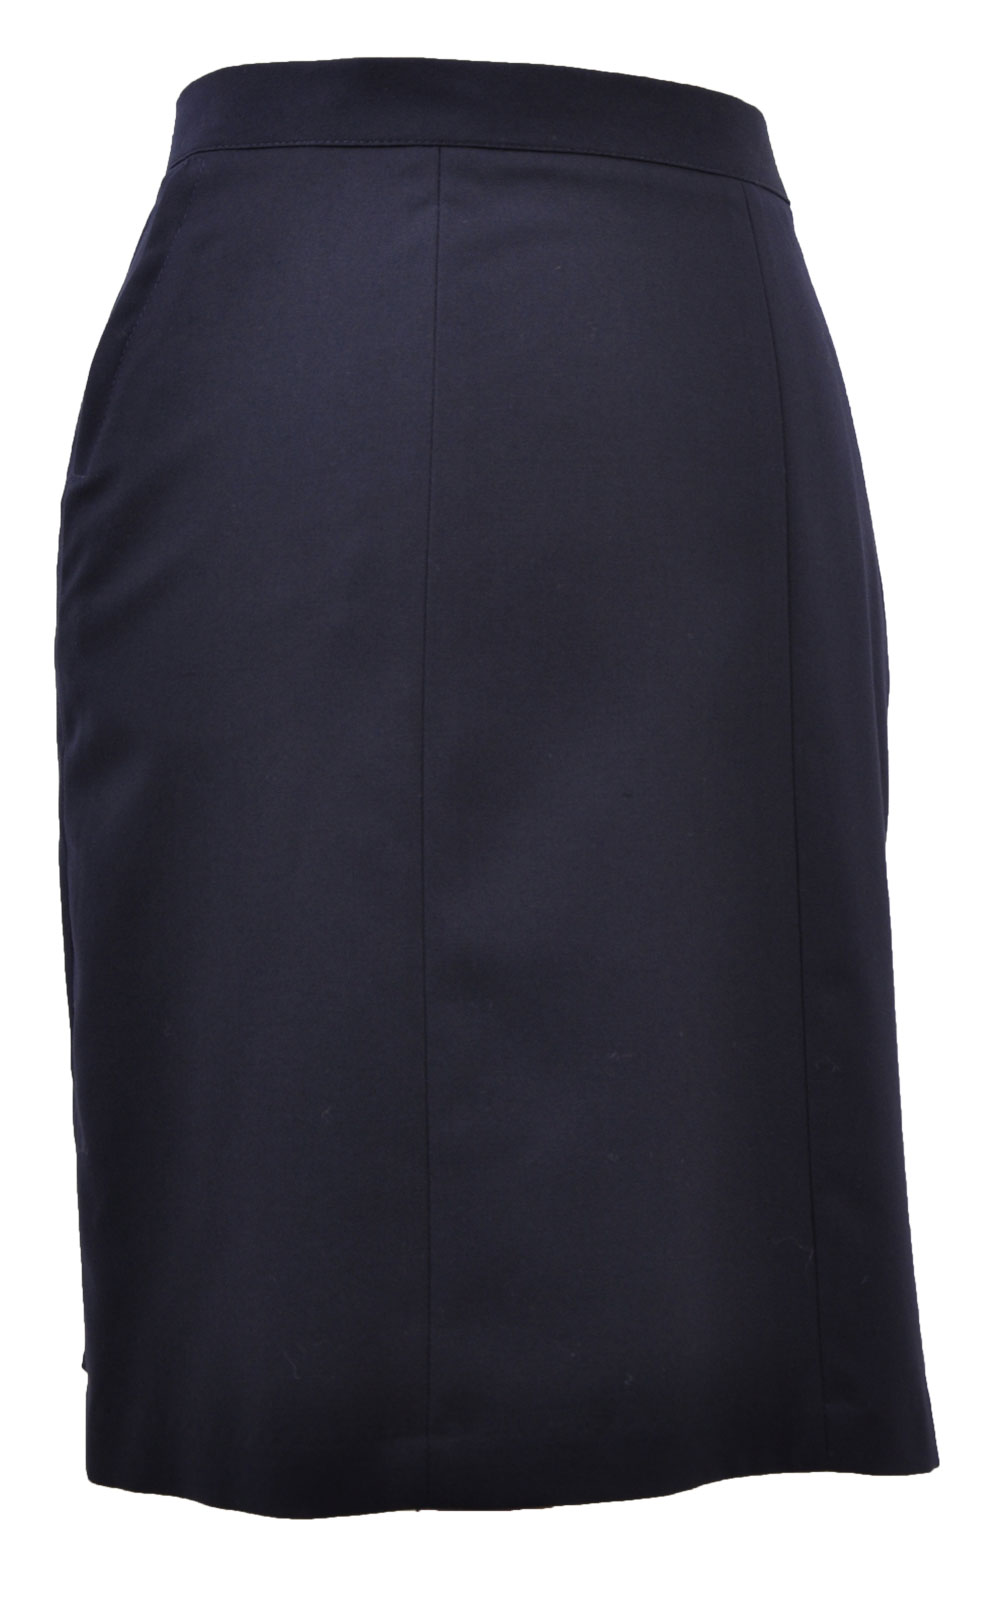 Picture of Dark Navy Six Panel Skirt